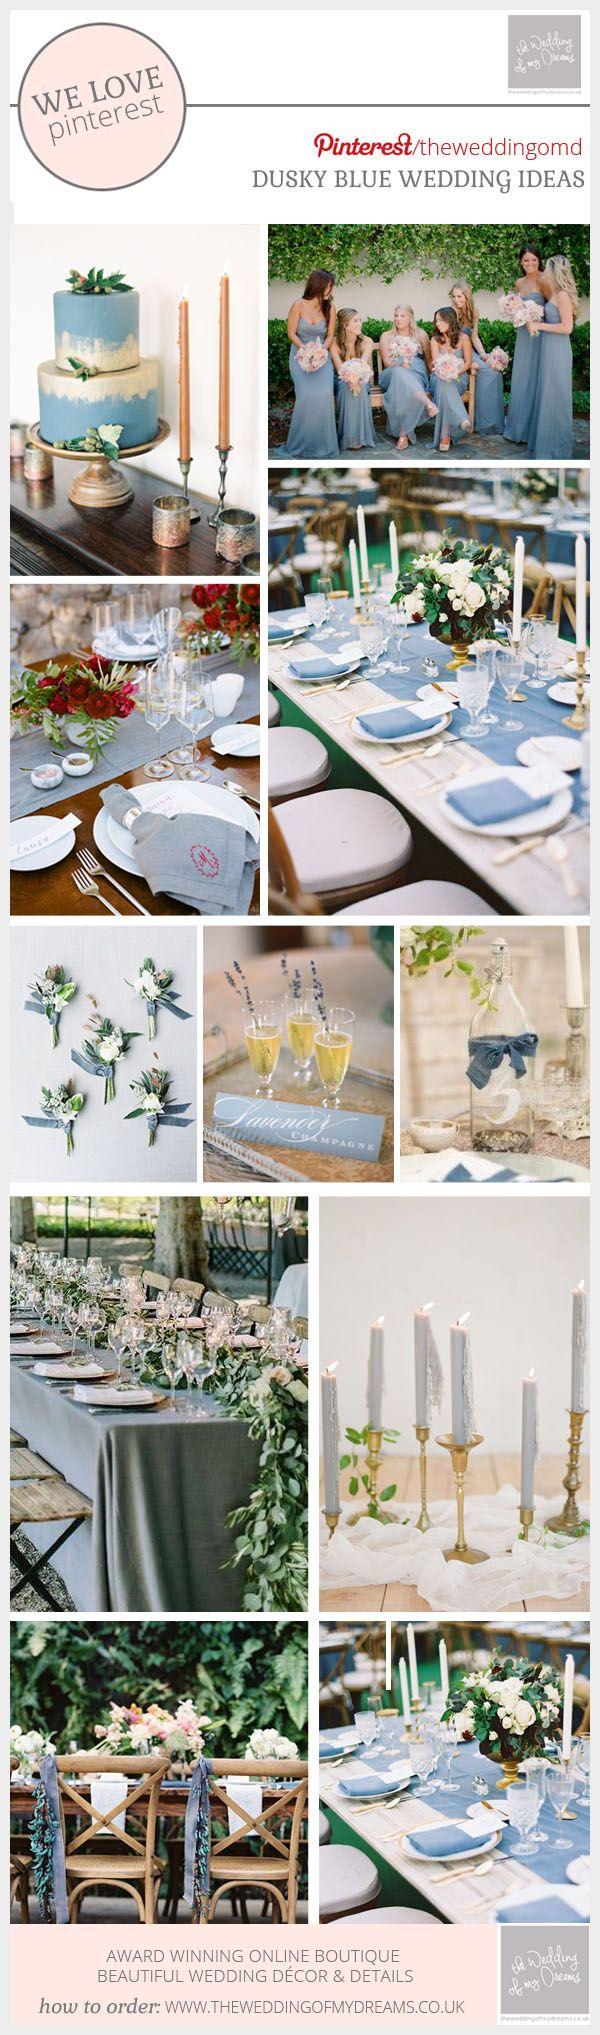 Dusky Blue Wedding Ideas – Decorations and Details